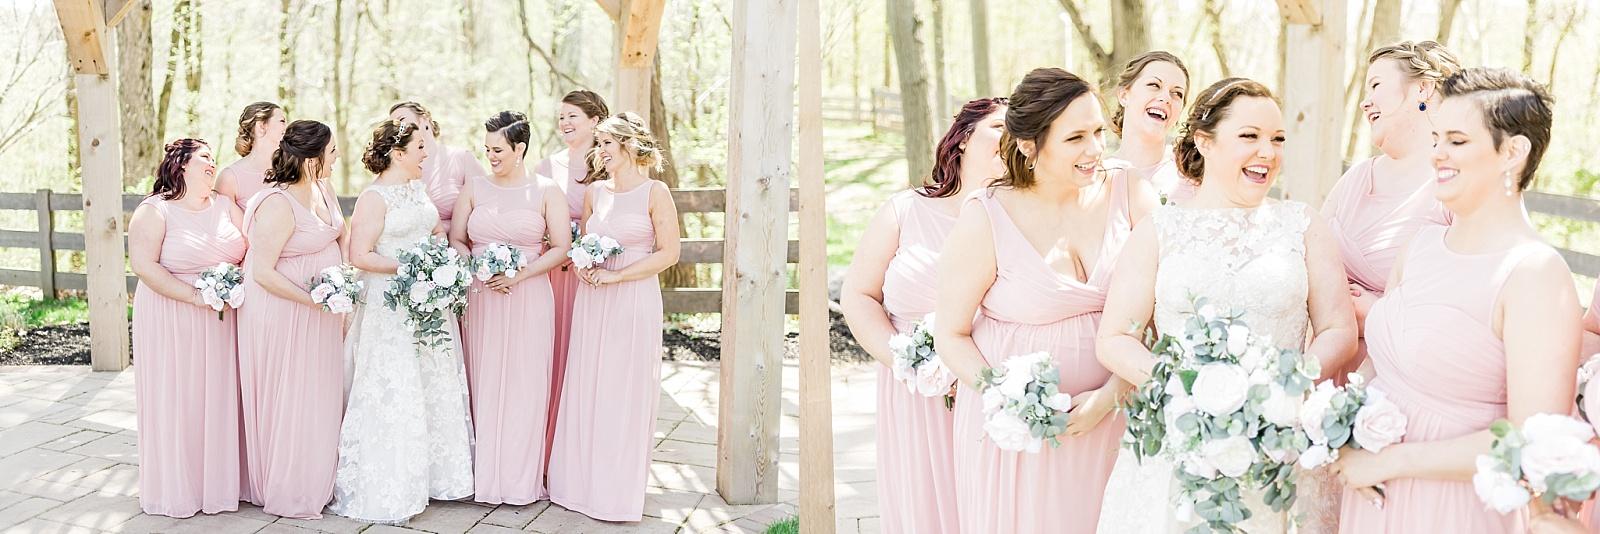 crawfordsville indiana stone creek lodge wedding rustic elegant friends theme_0130.jpg